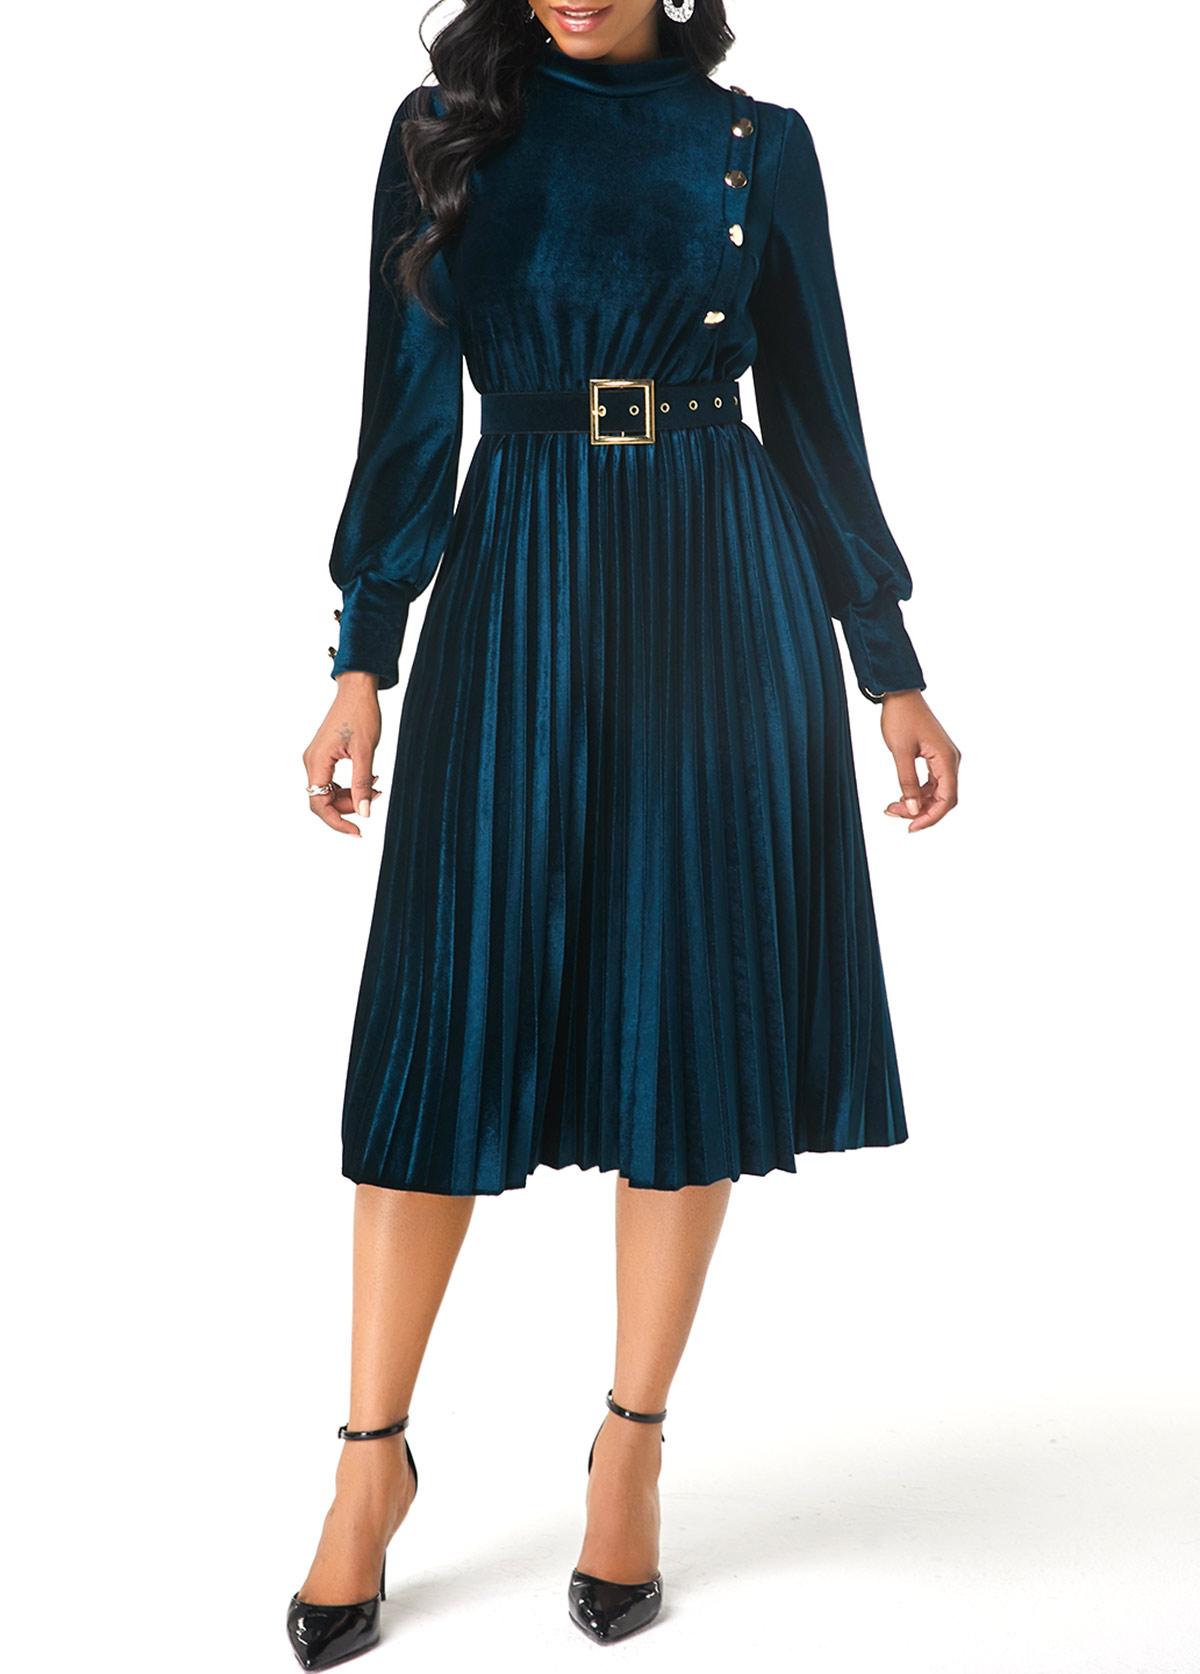 Button Decorated Long Sleeve Velvet Dress